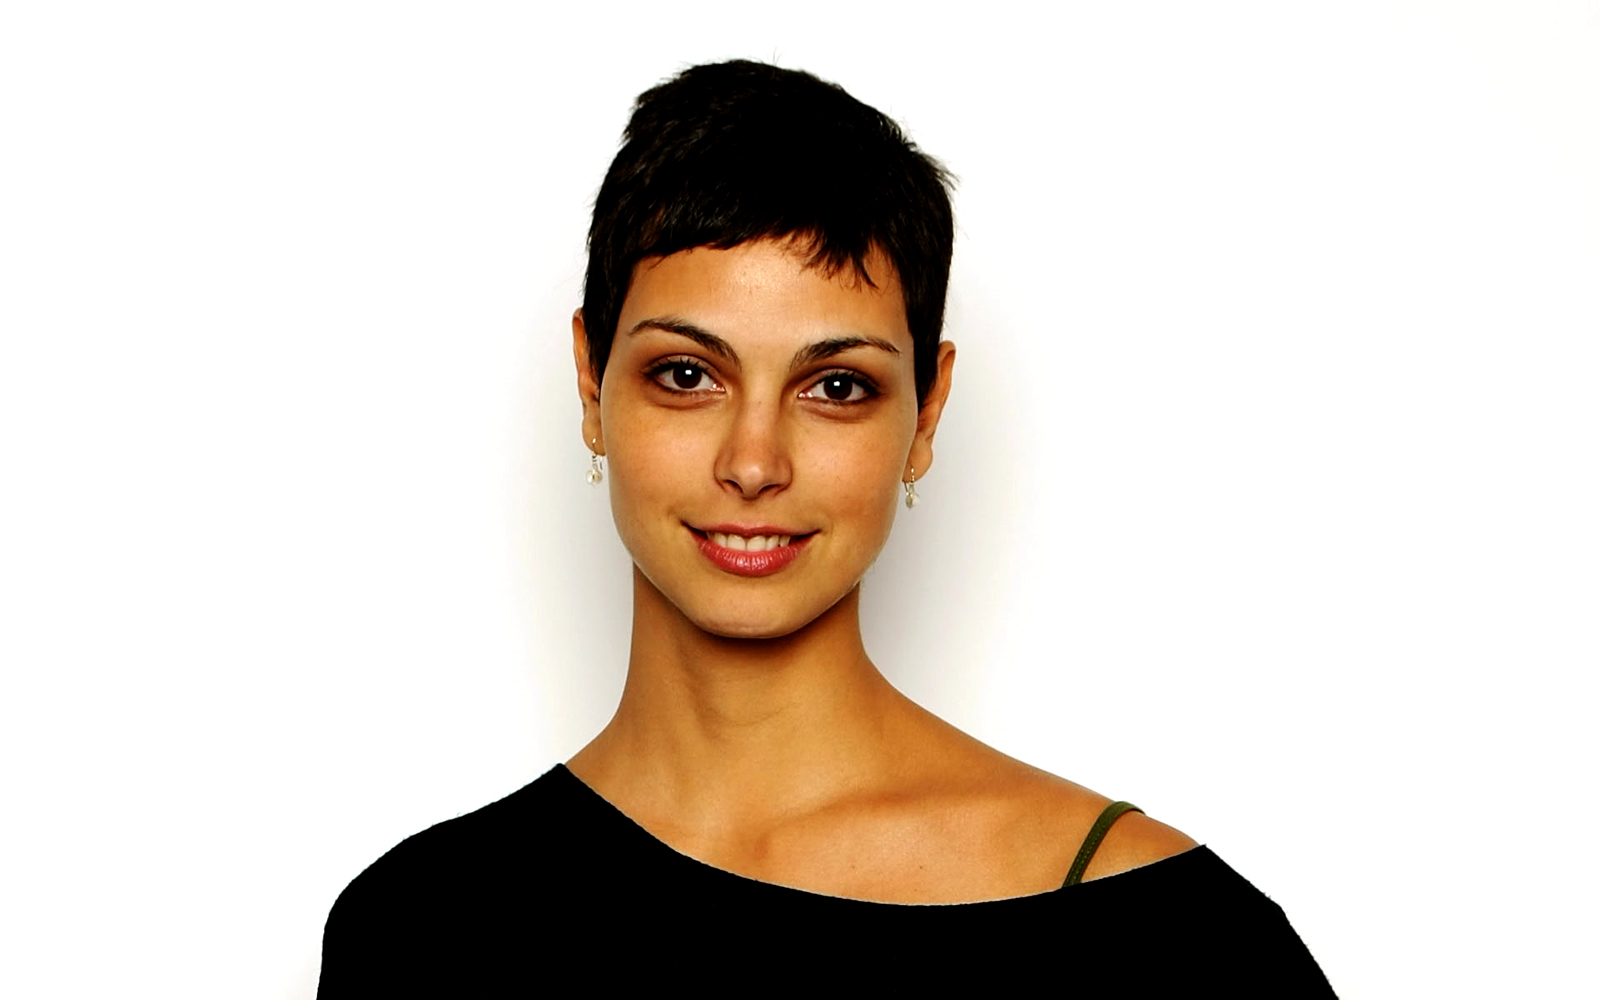 http://4.bp.blogspot.com/-NaQhmXaPeDk/TyCHNMgLw5I/AAAAAAAAAYc/UDR8h-TXgCo/s1600/Morena_Baccarin_Short_Hair_Celebrity_HD_Wallpaper-Vvallpaper.Net.jpg